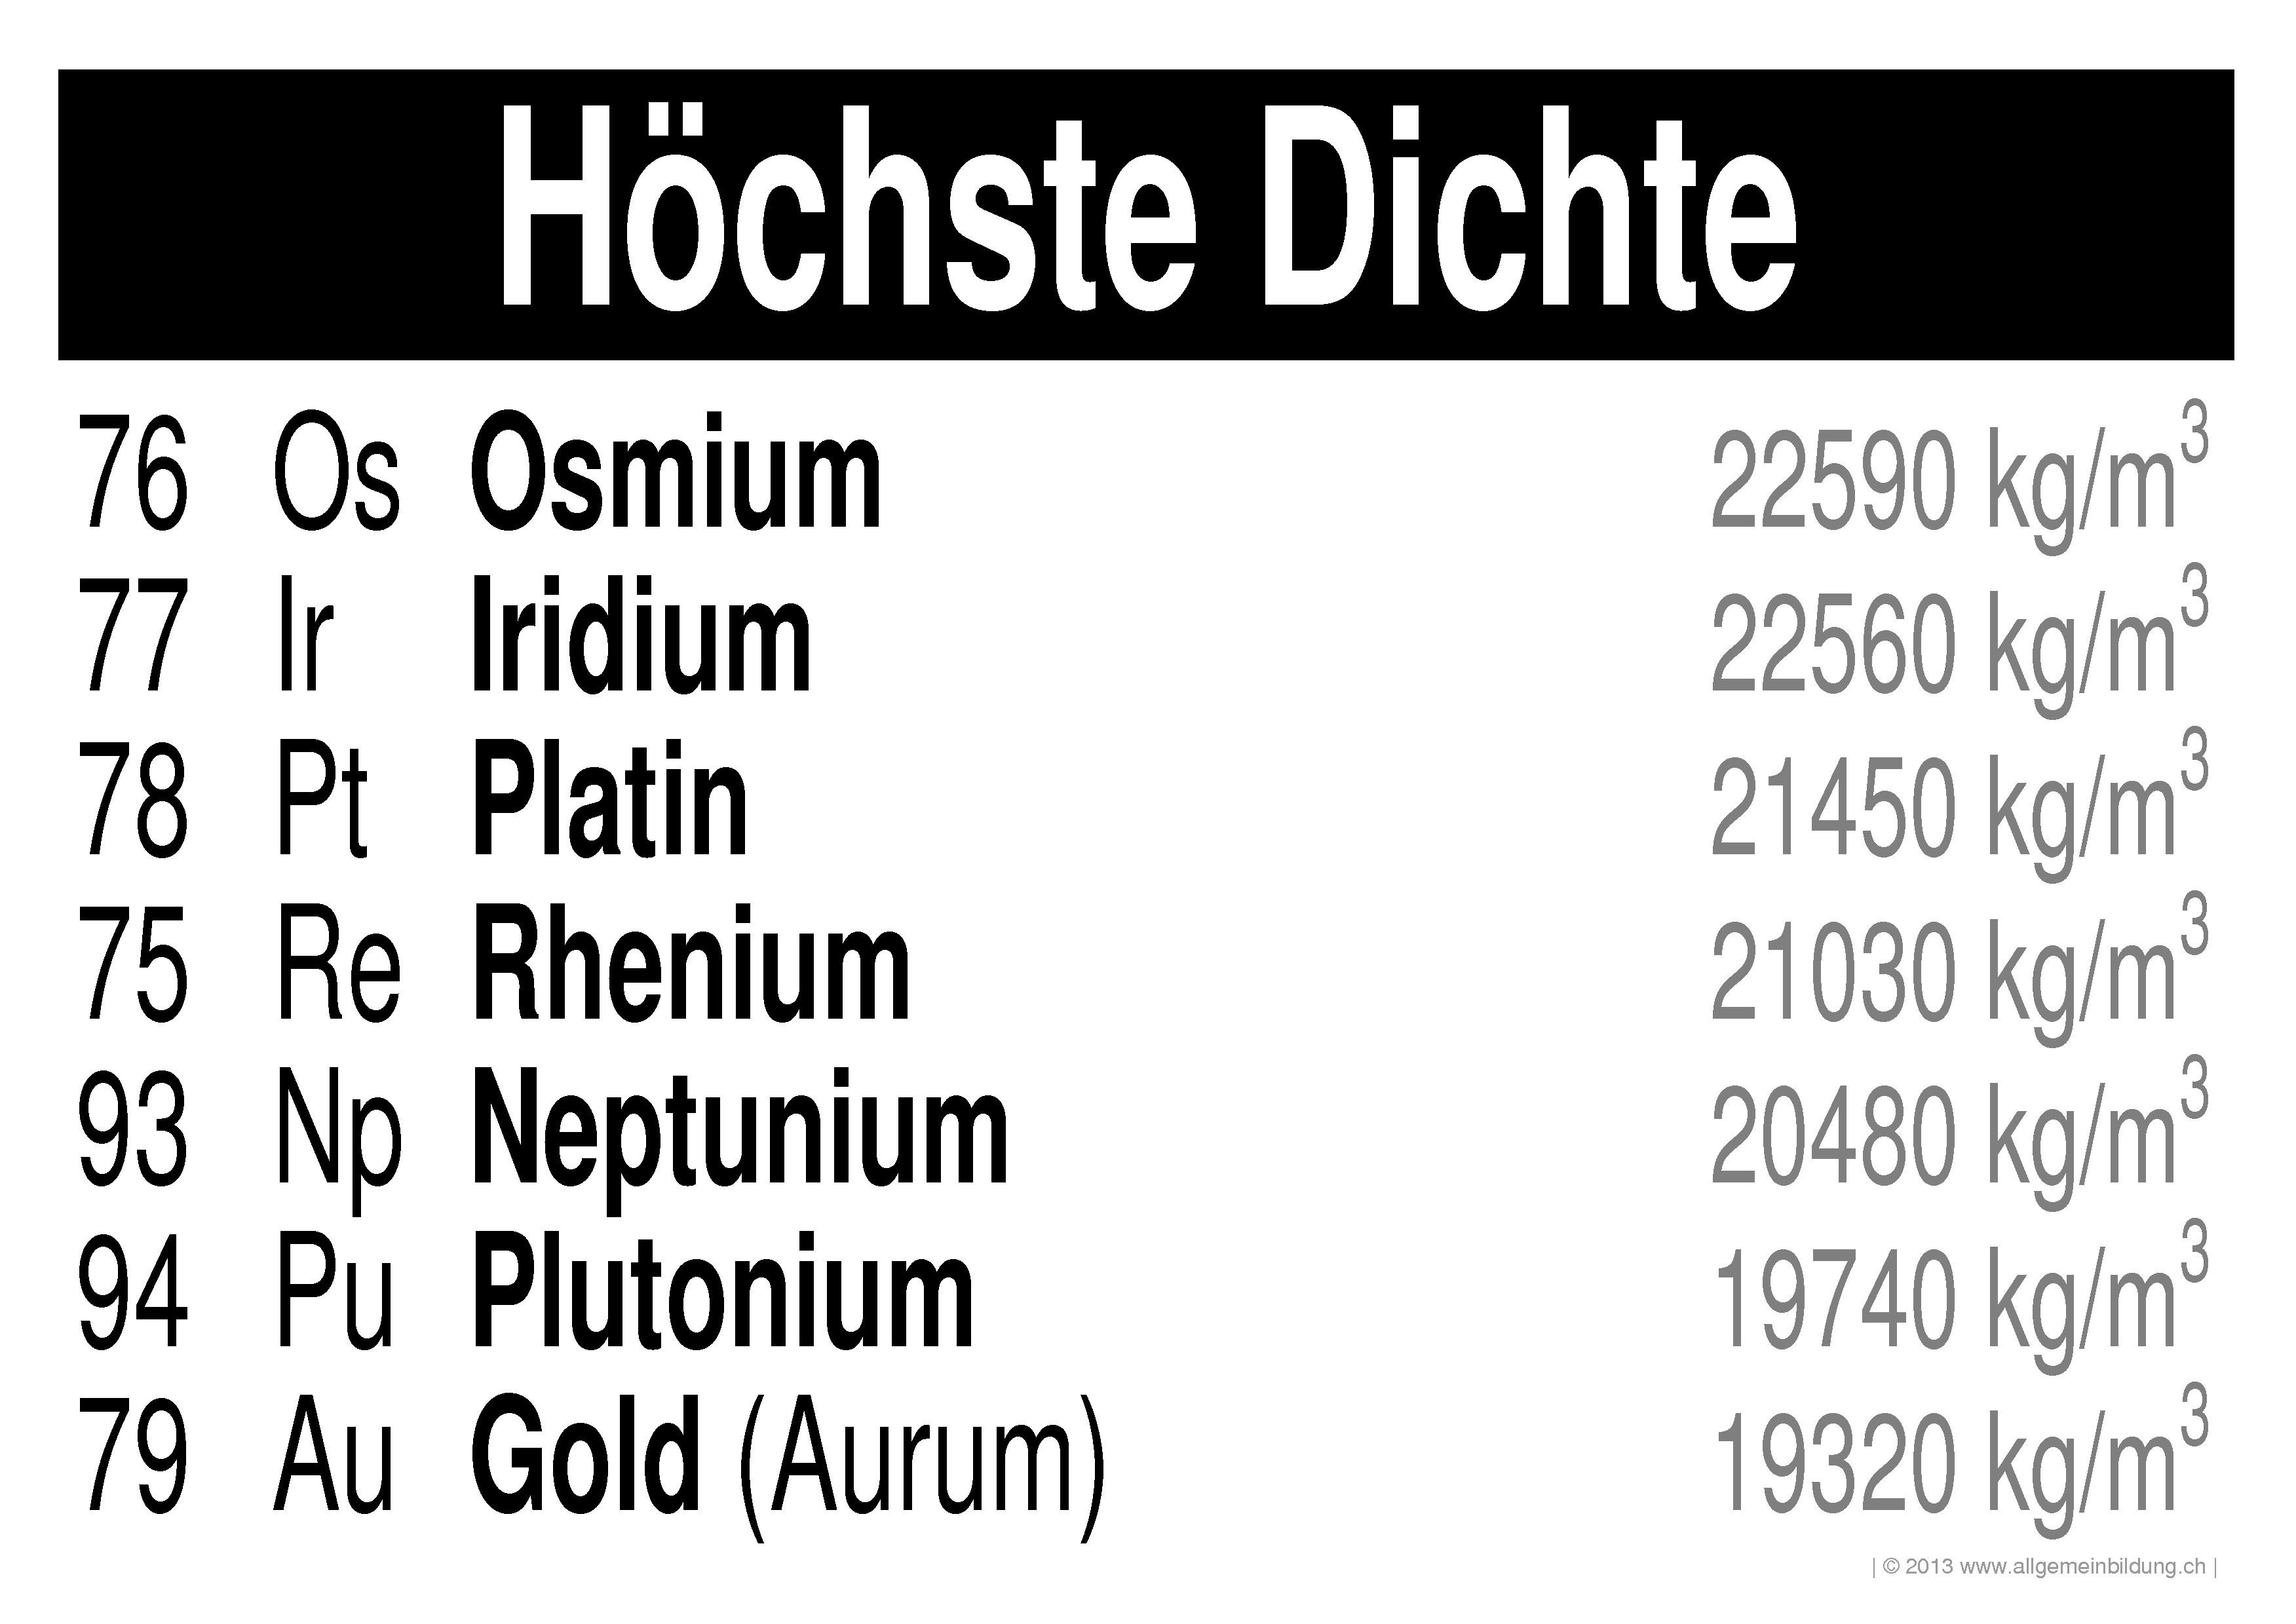 chemie lernplakate wissensposter pse elemente mit h chster dichte 8500 bungen. Black Bedroom Furniture Sets. Home Design Ideas